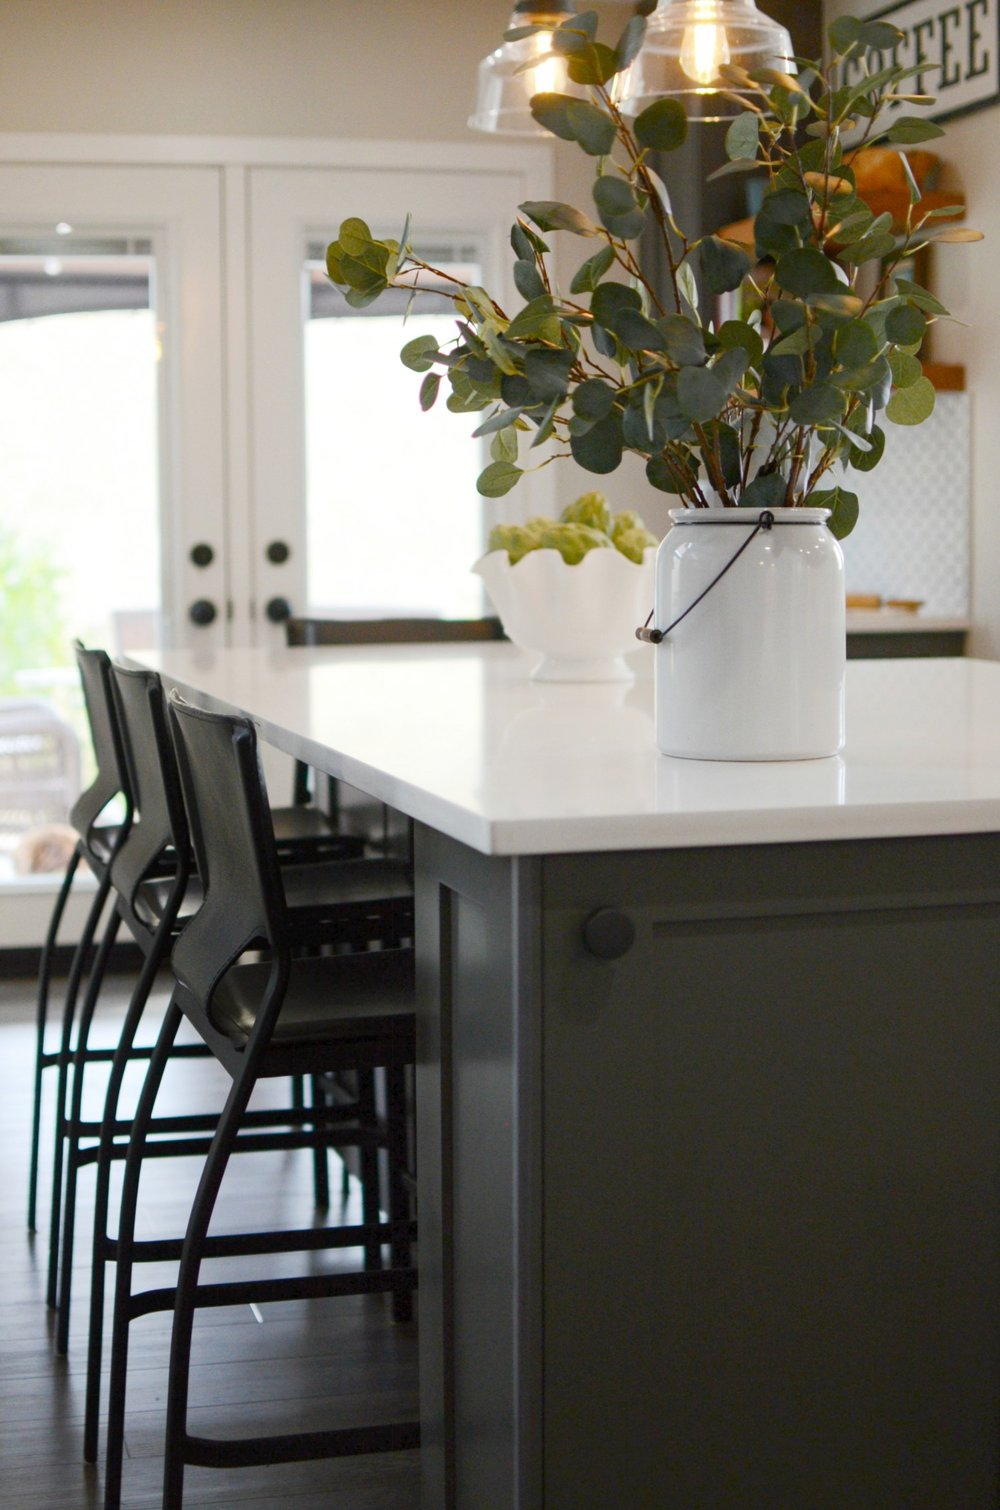 calgary-interior-design-kitchen-renovation-modern-farmhouse-12.jpg